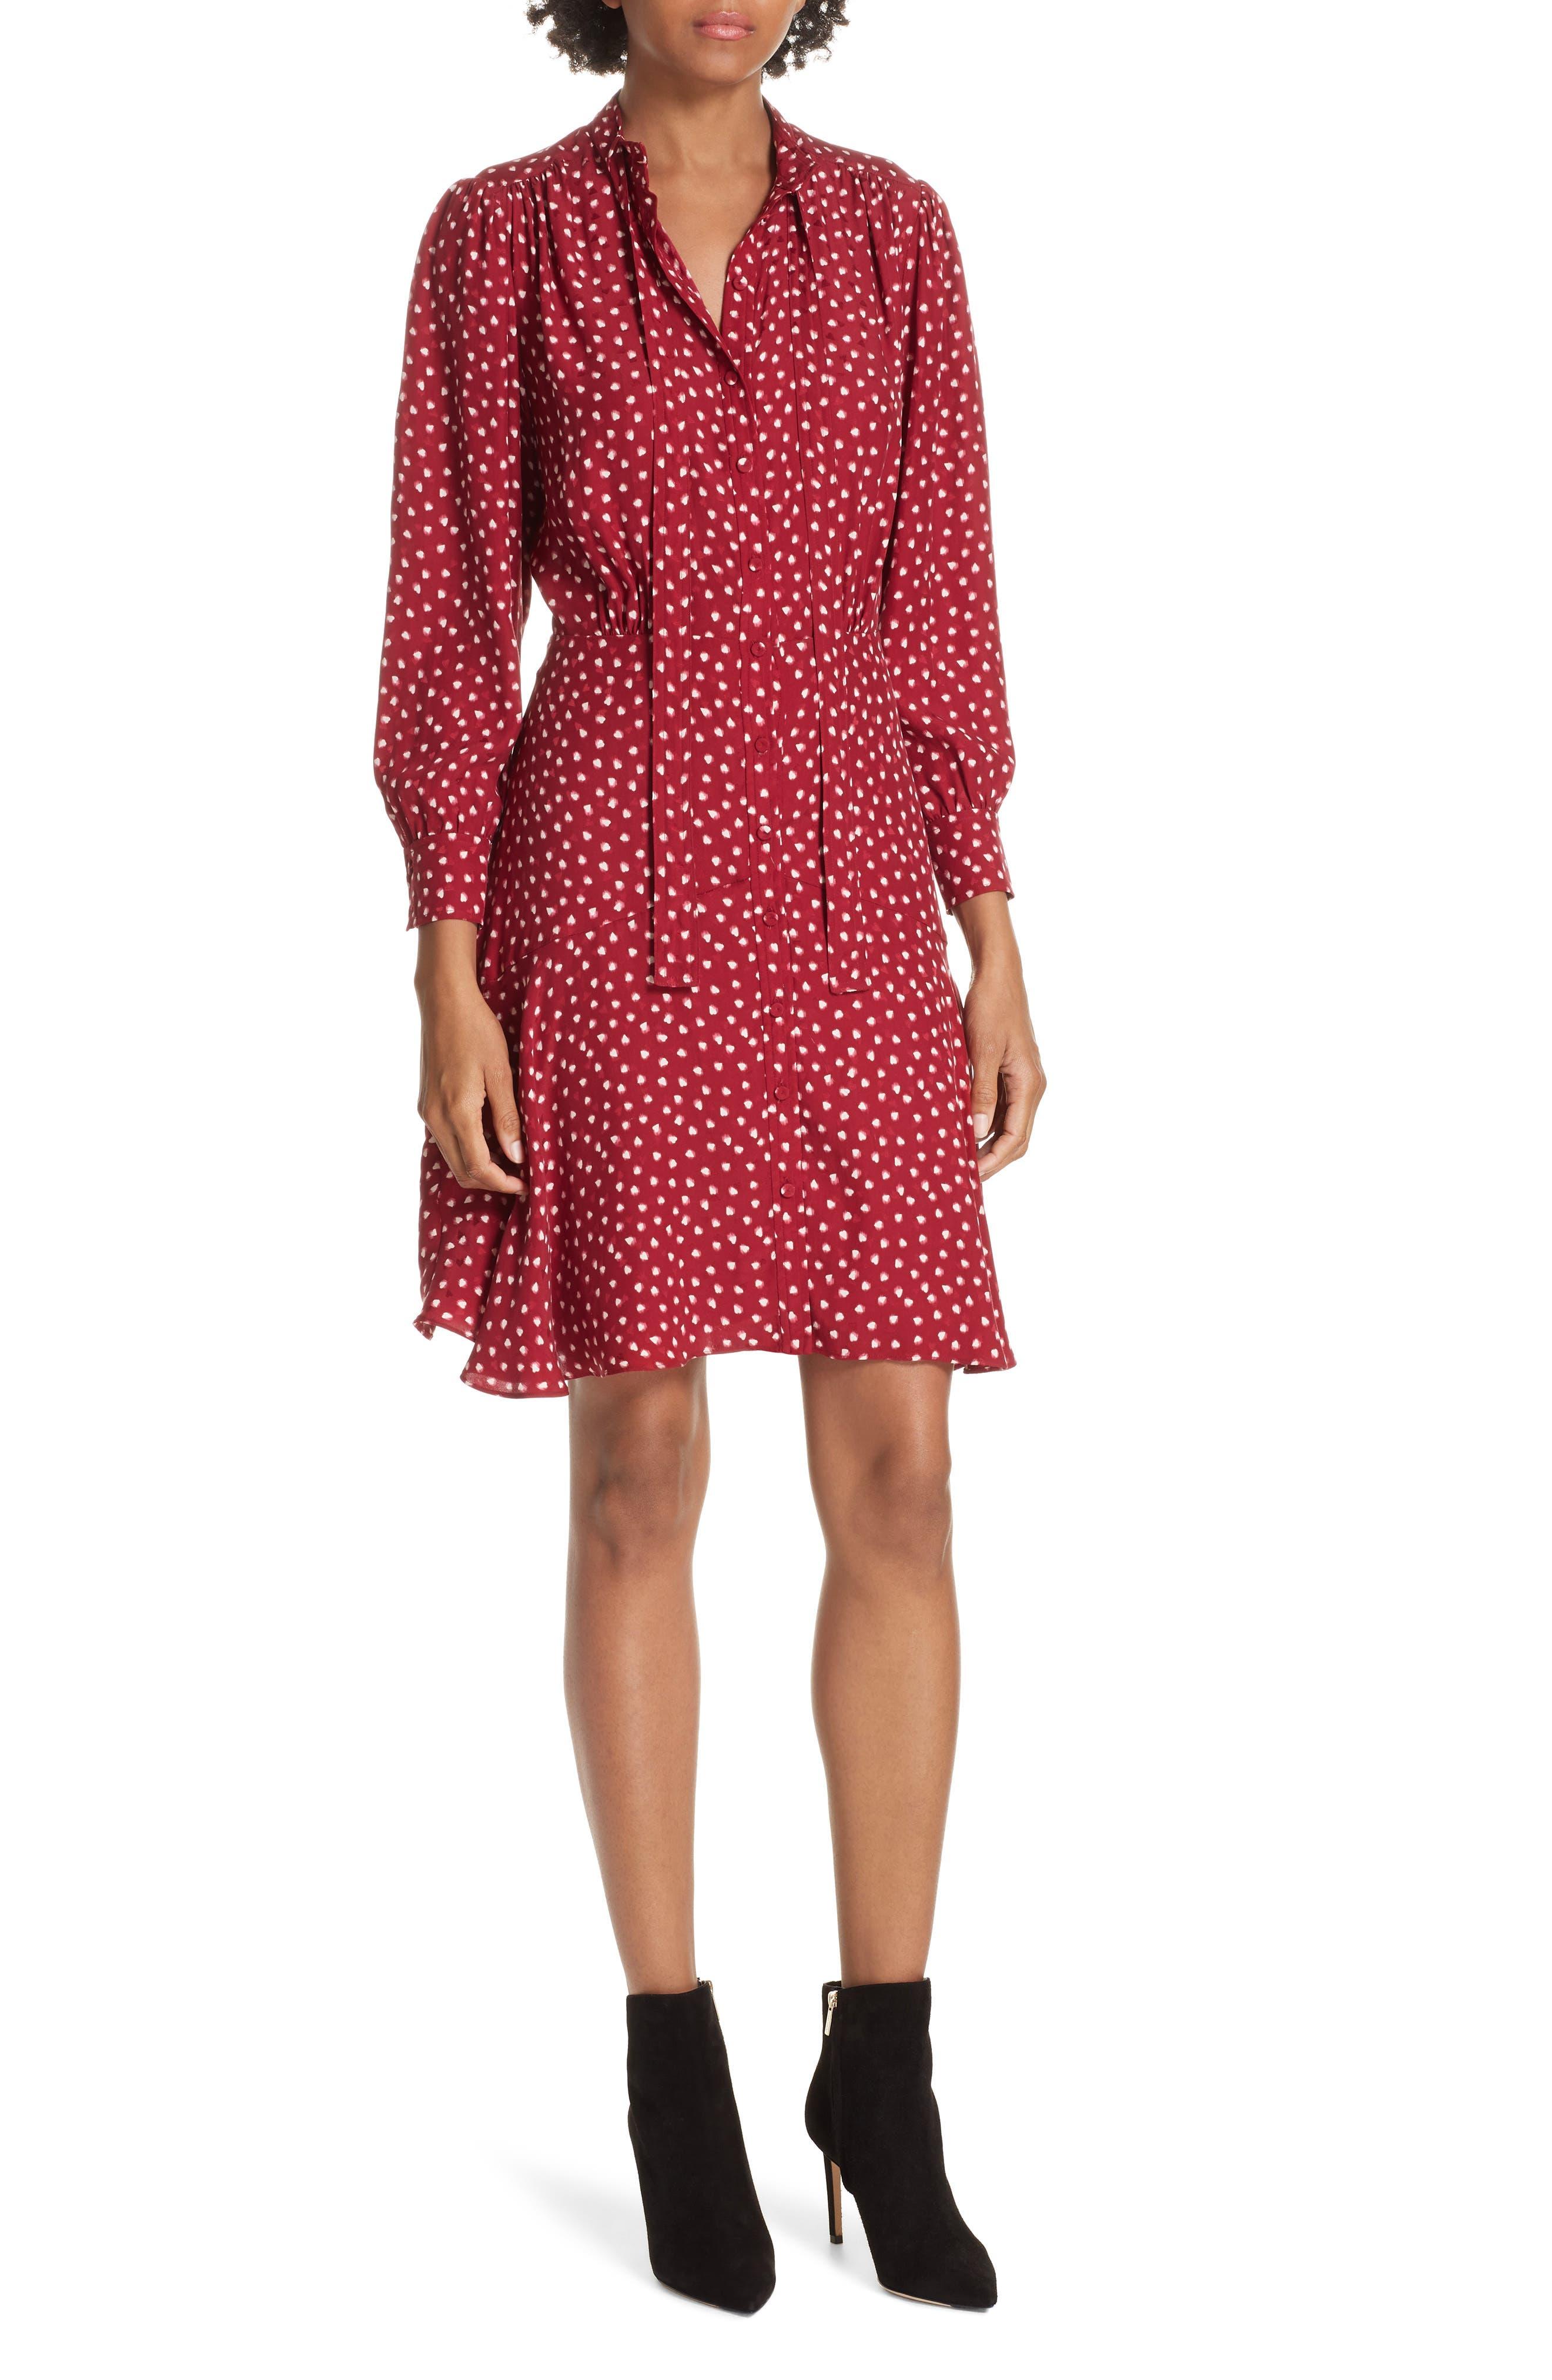 REBECCA TAYLOR,                             Dot Print Fit & Flare Dress,                             Main thumbnail 1, color,                             602